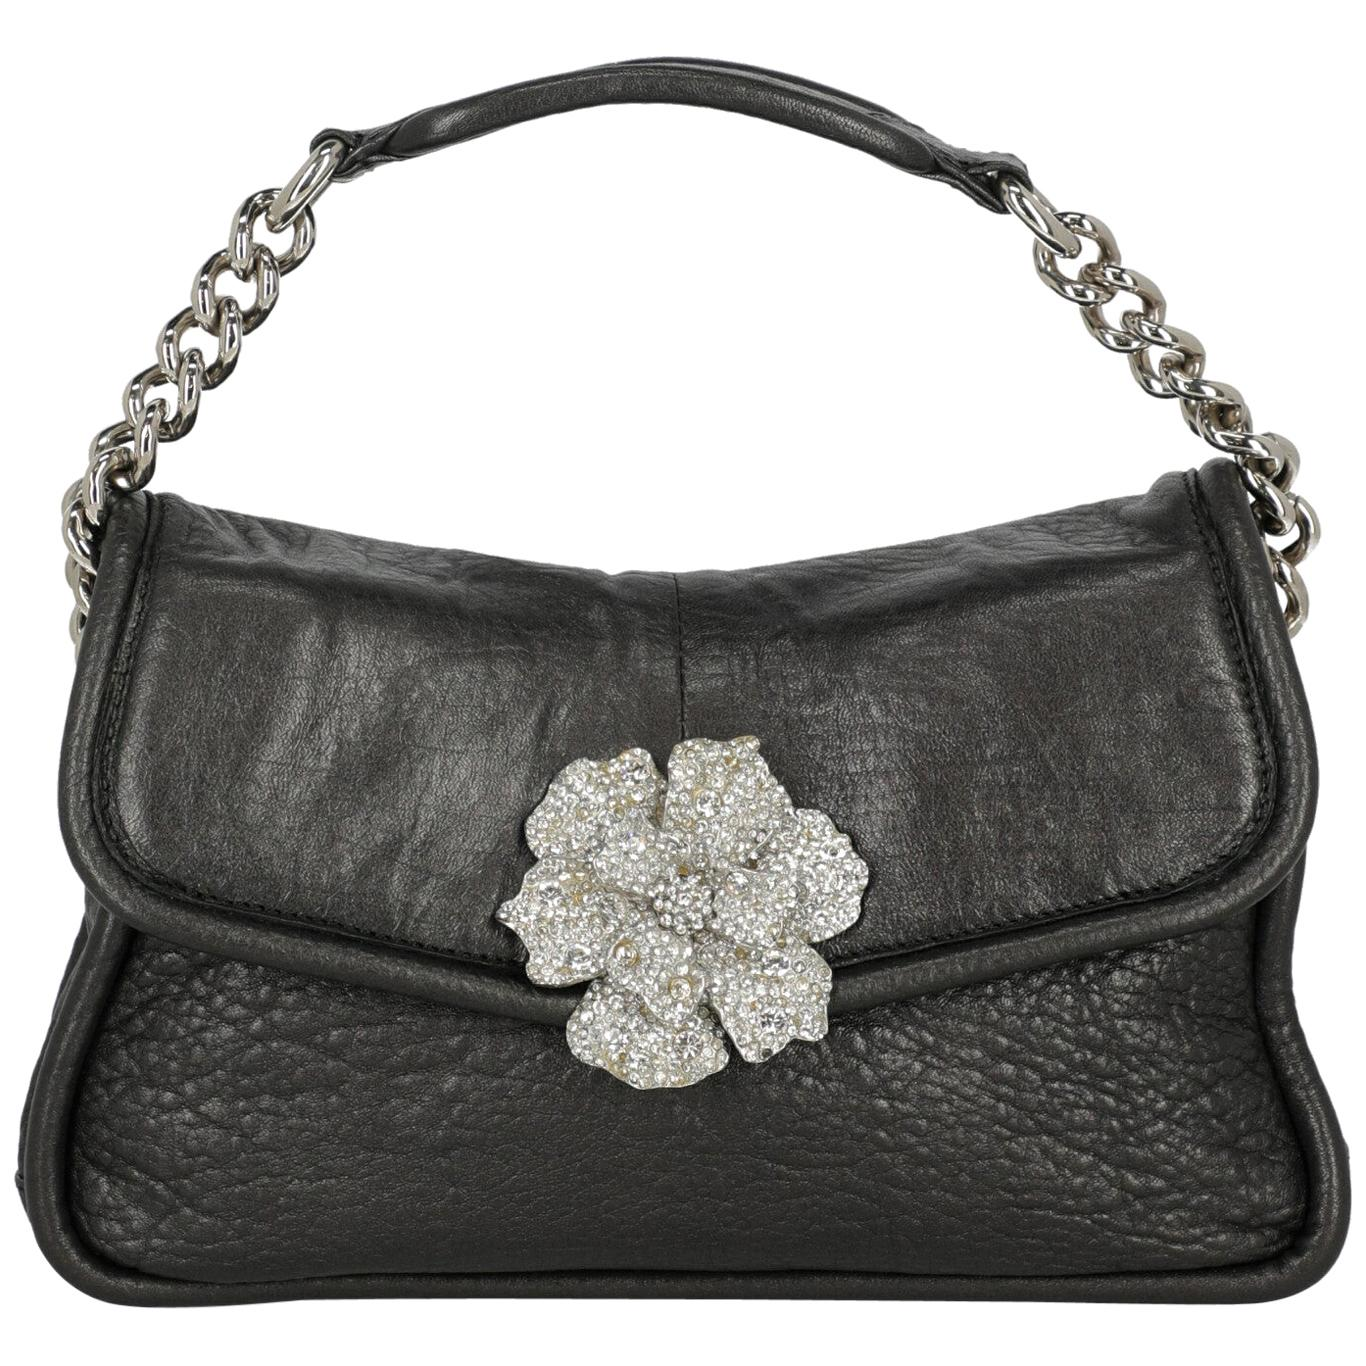 Sonia Rykiel Woman Handbag Anthracite Leather